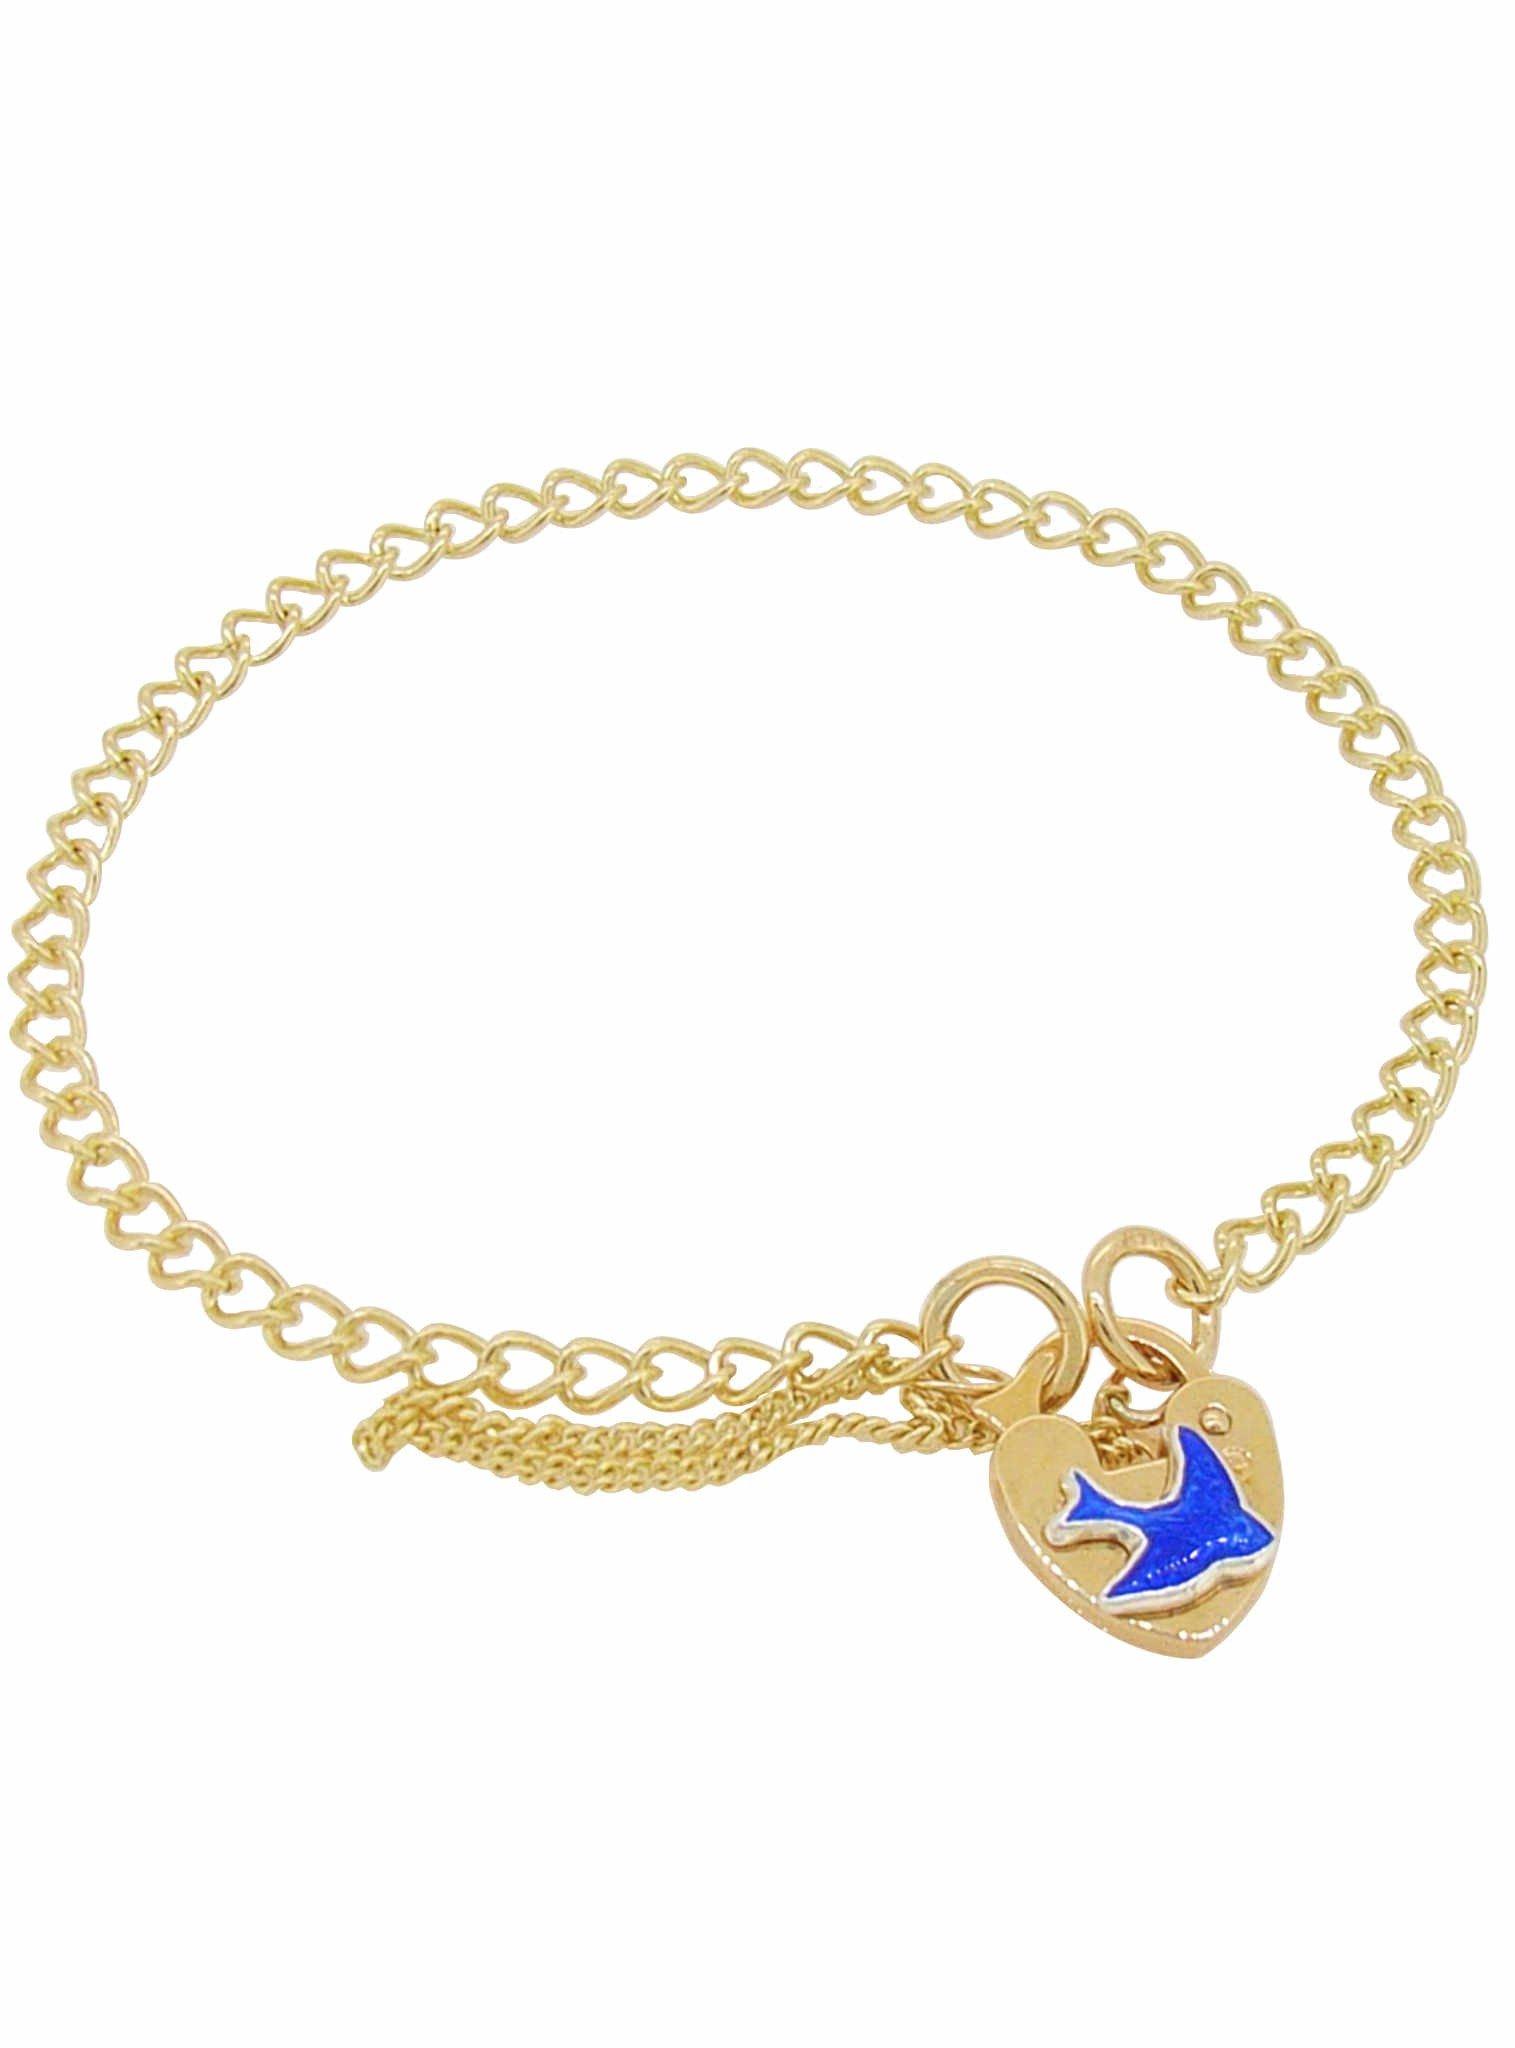 Curb Link Bluebird of Happiness Padlock Charm Bracelet 9ct Gold